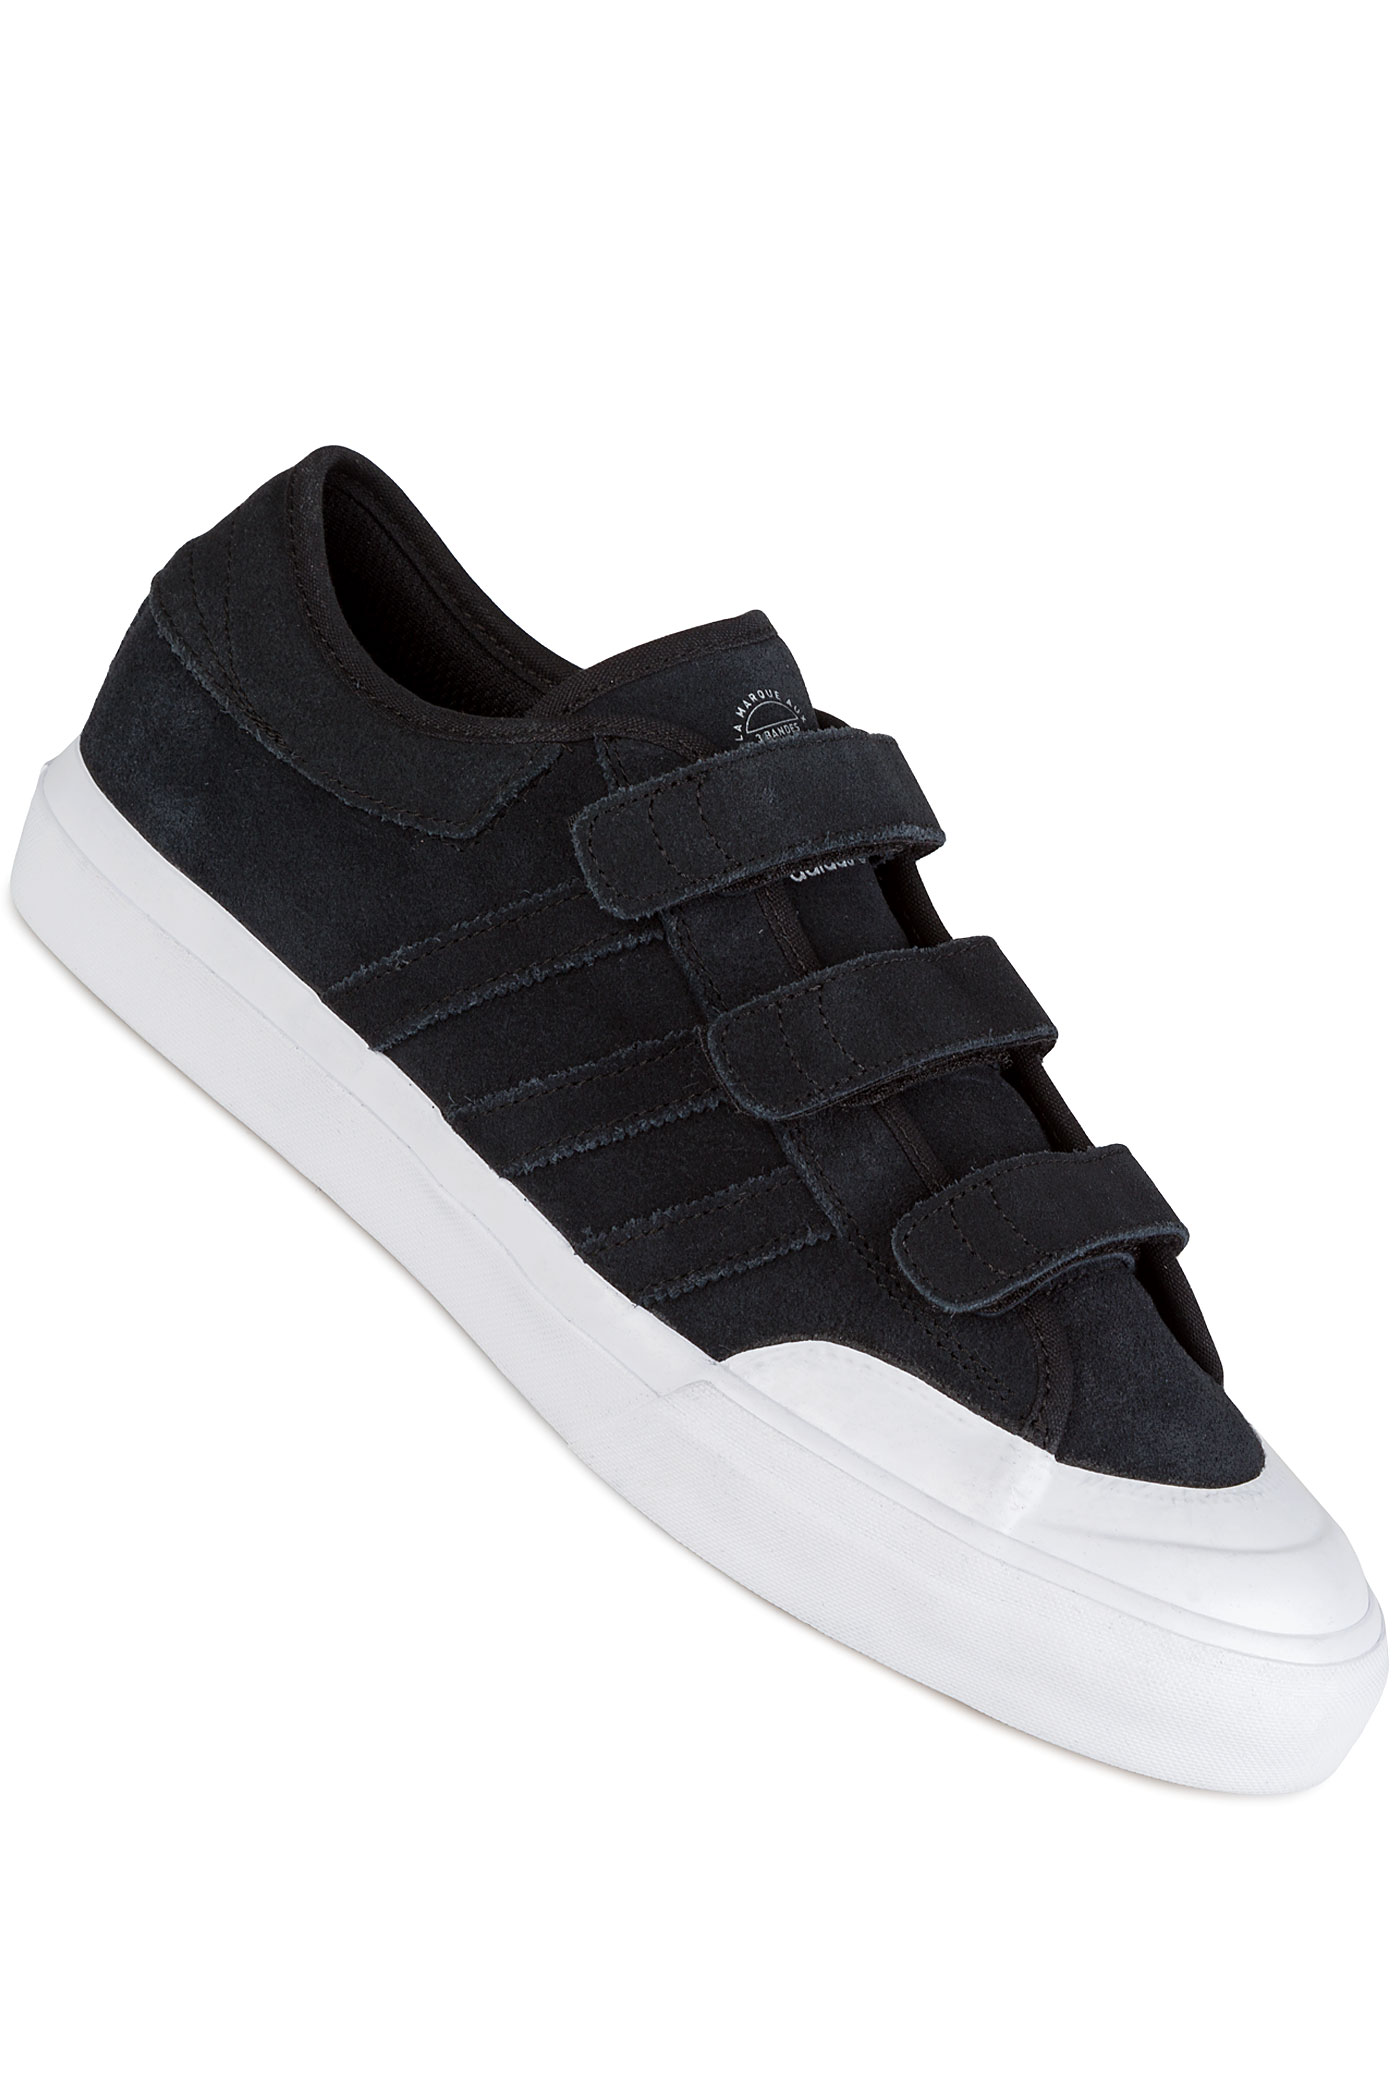 adidas skateboarding comprar